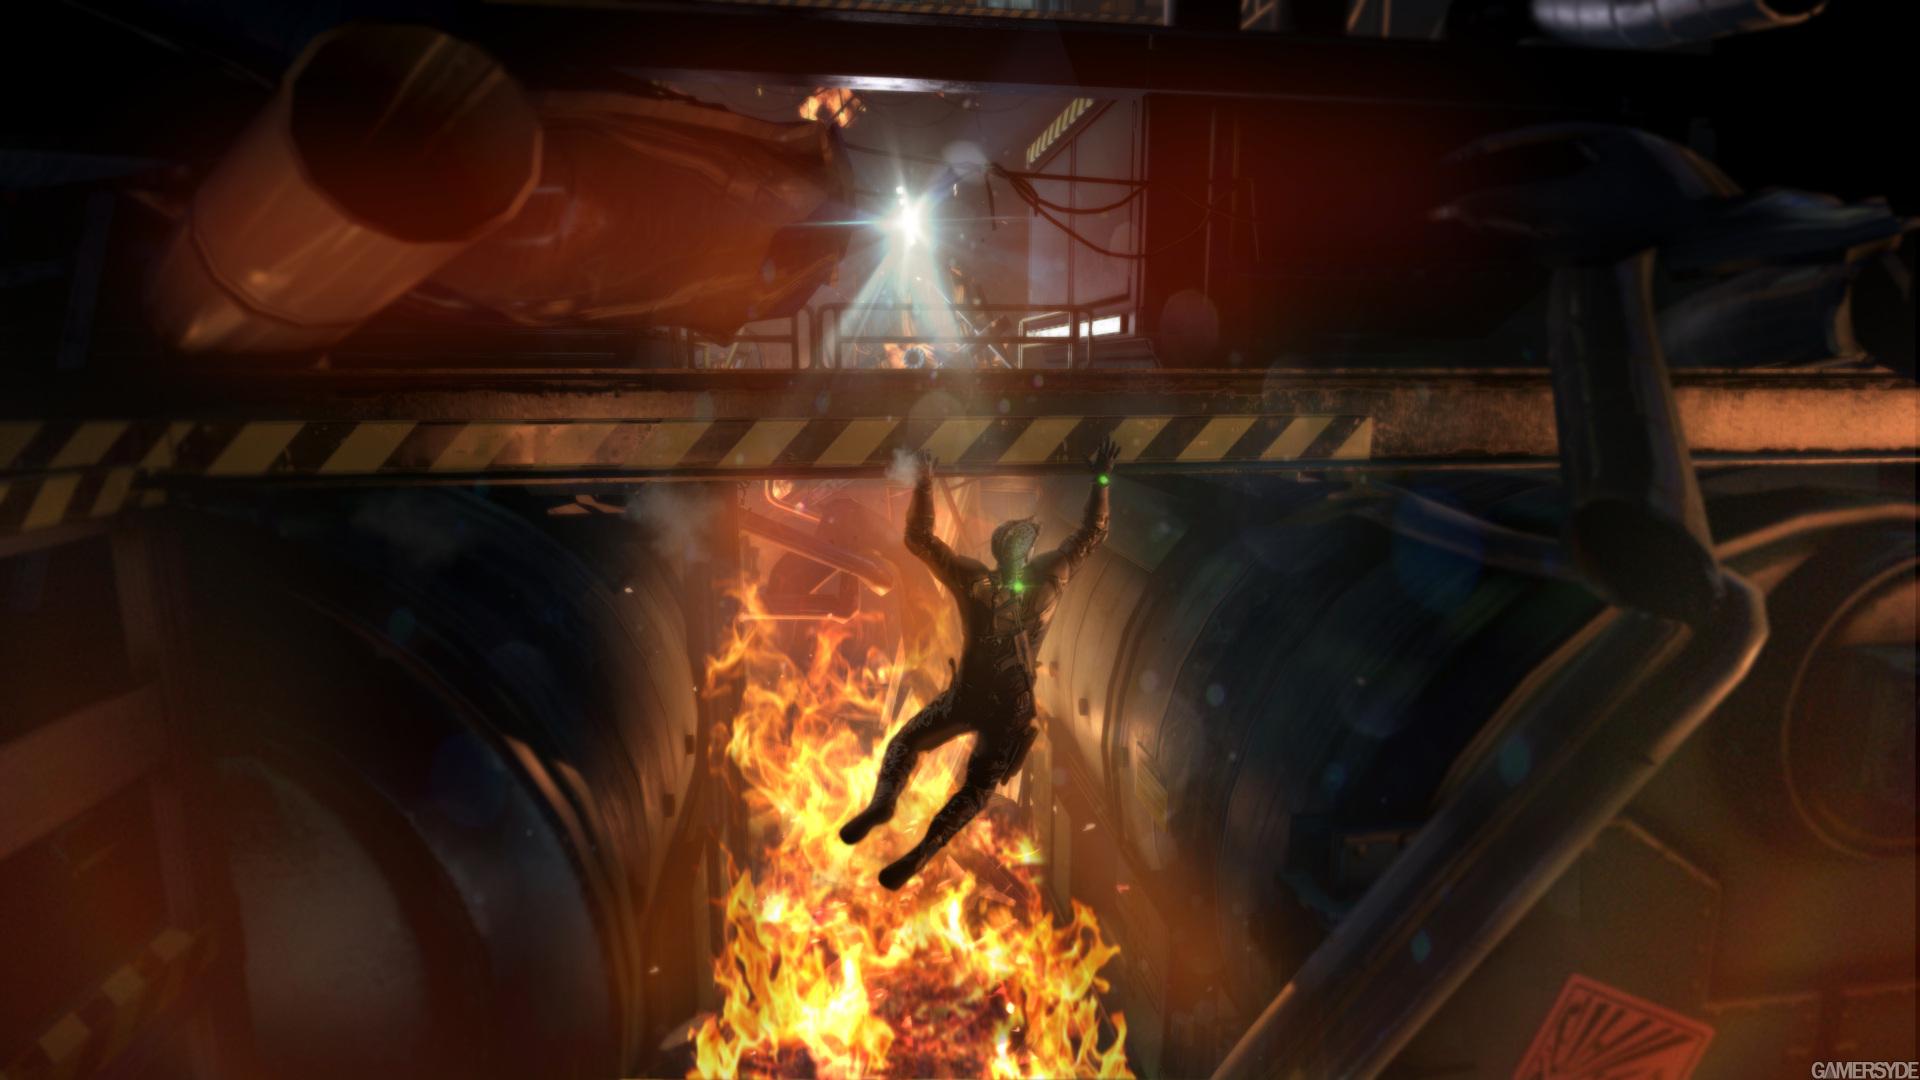 image tom clancy s splinter cell blacklist 22410 2521 0003 با تصاویر جدید Splinter Cell: Blacklist همراه باشید